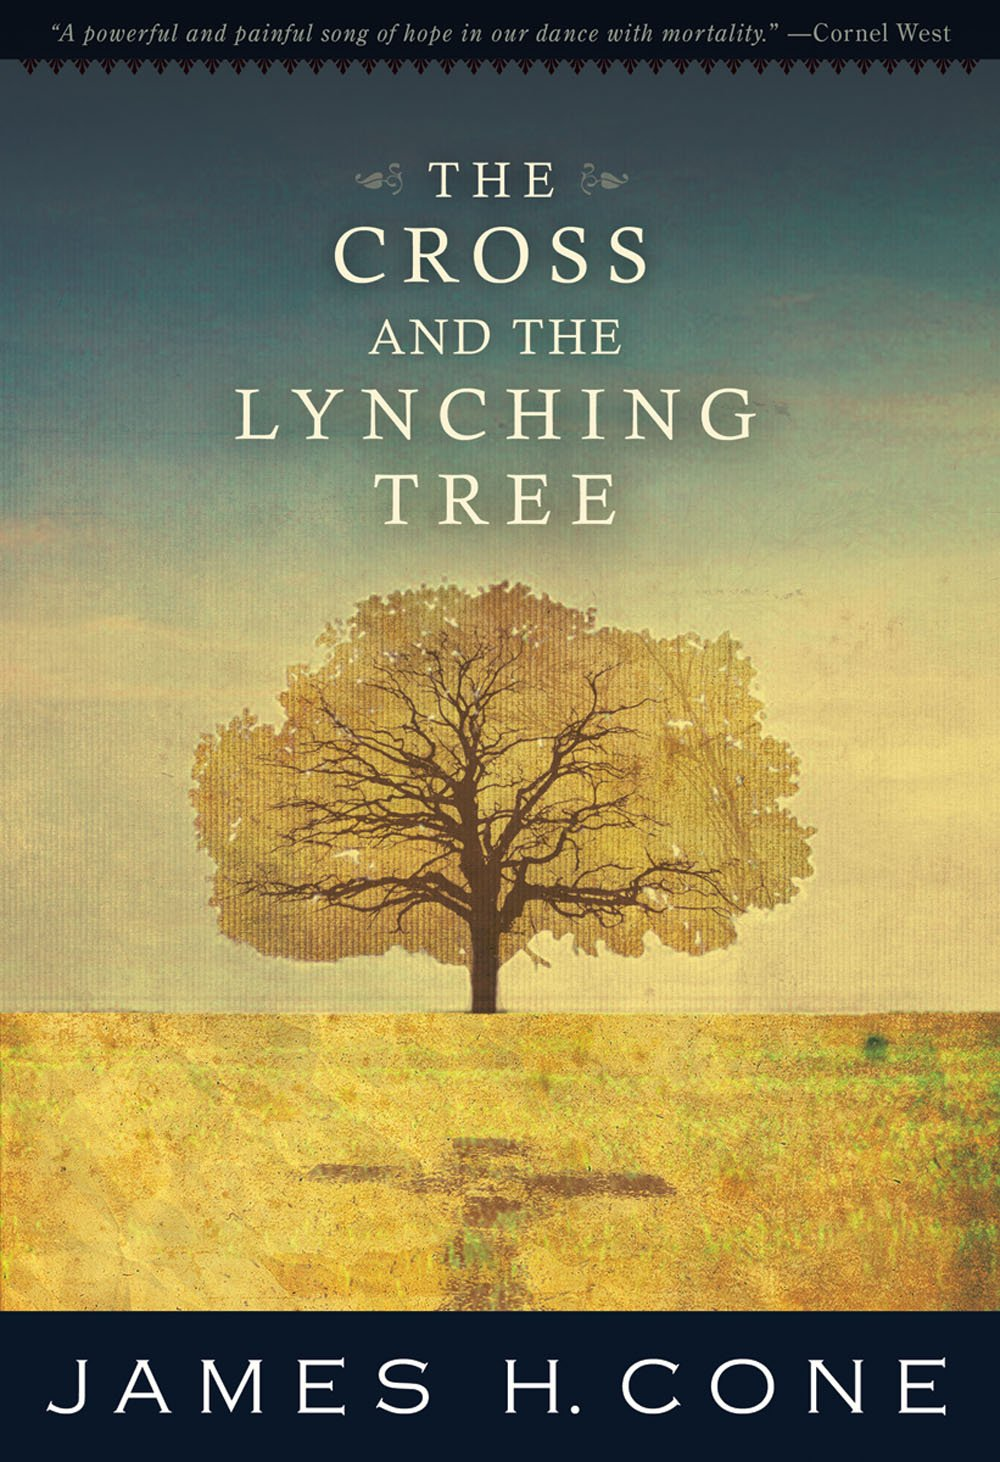 cross and lynching tree cone.jpg